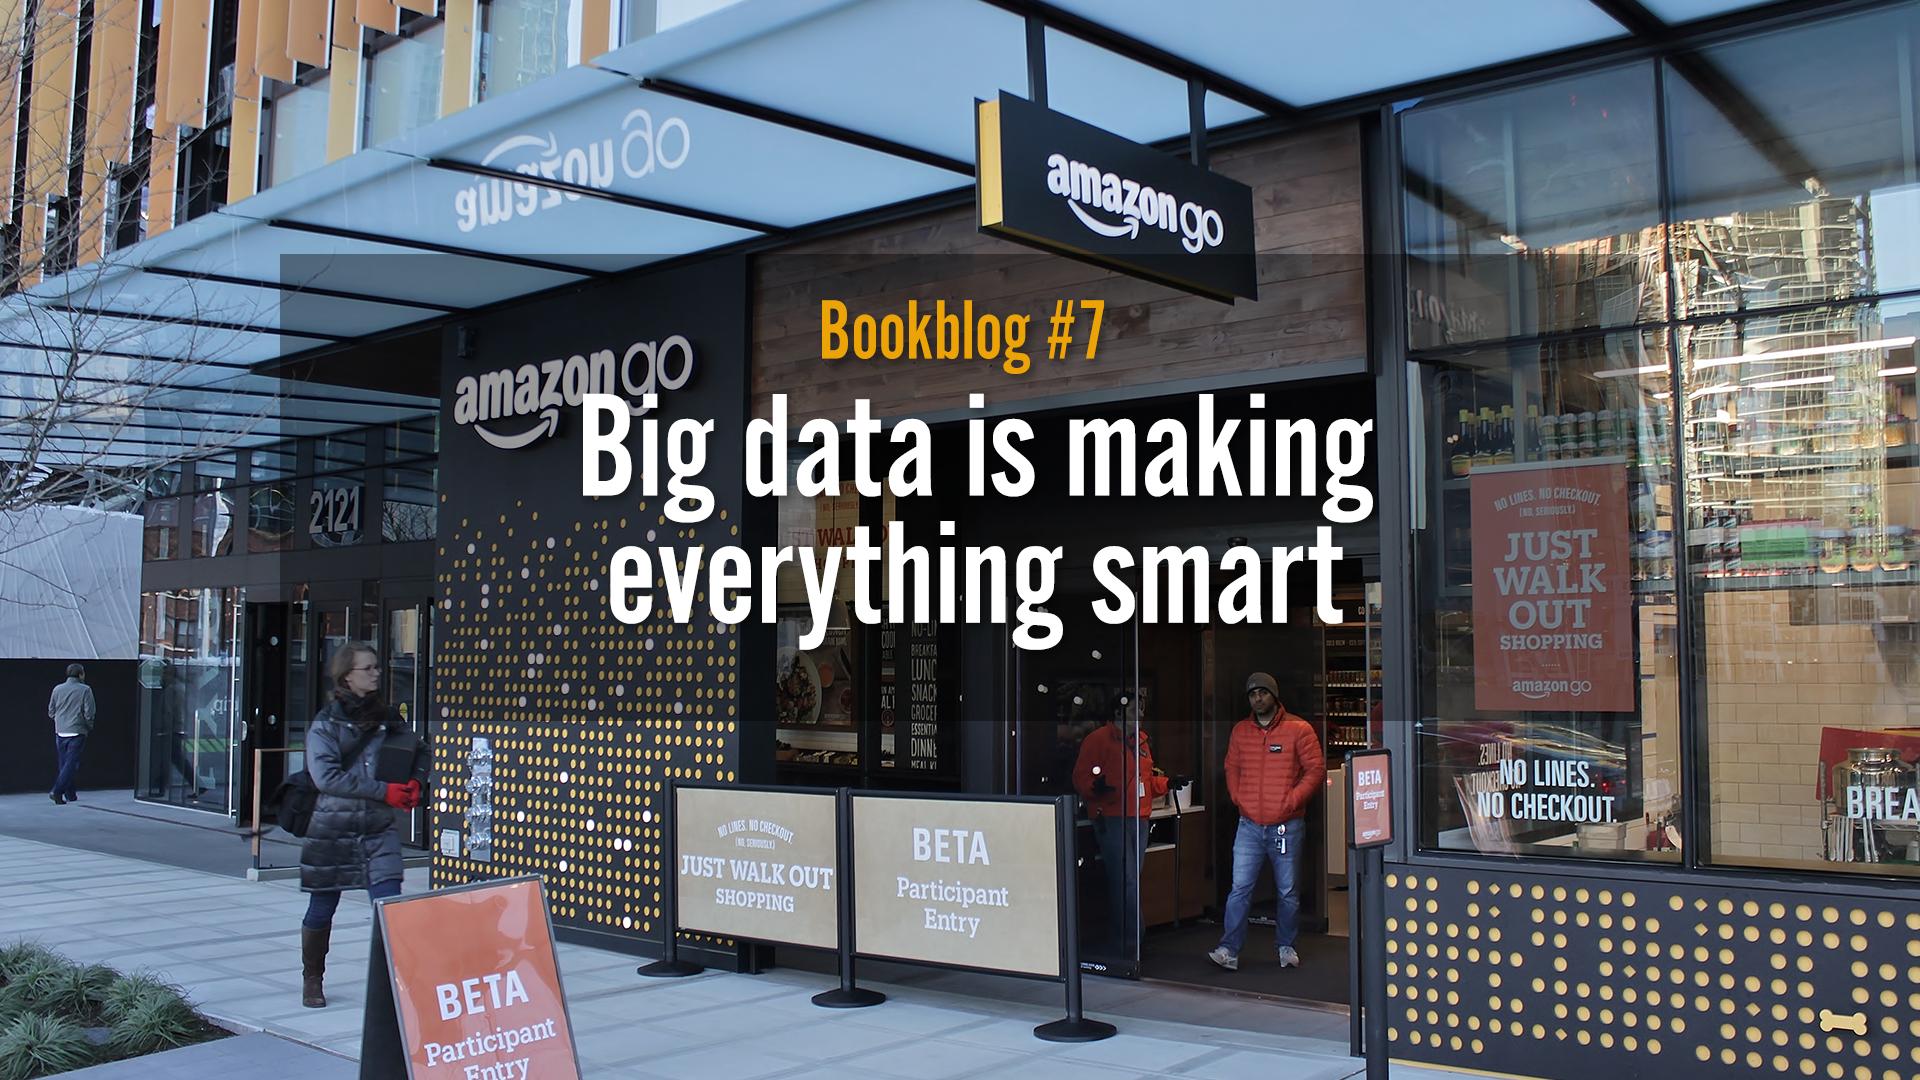 Big data is making everything smart